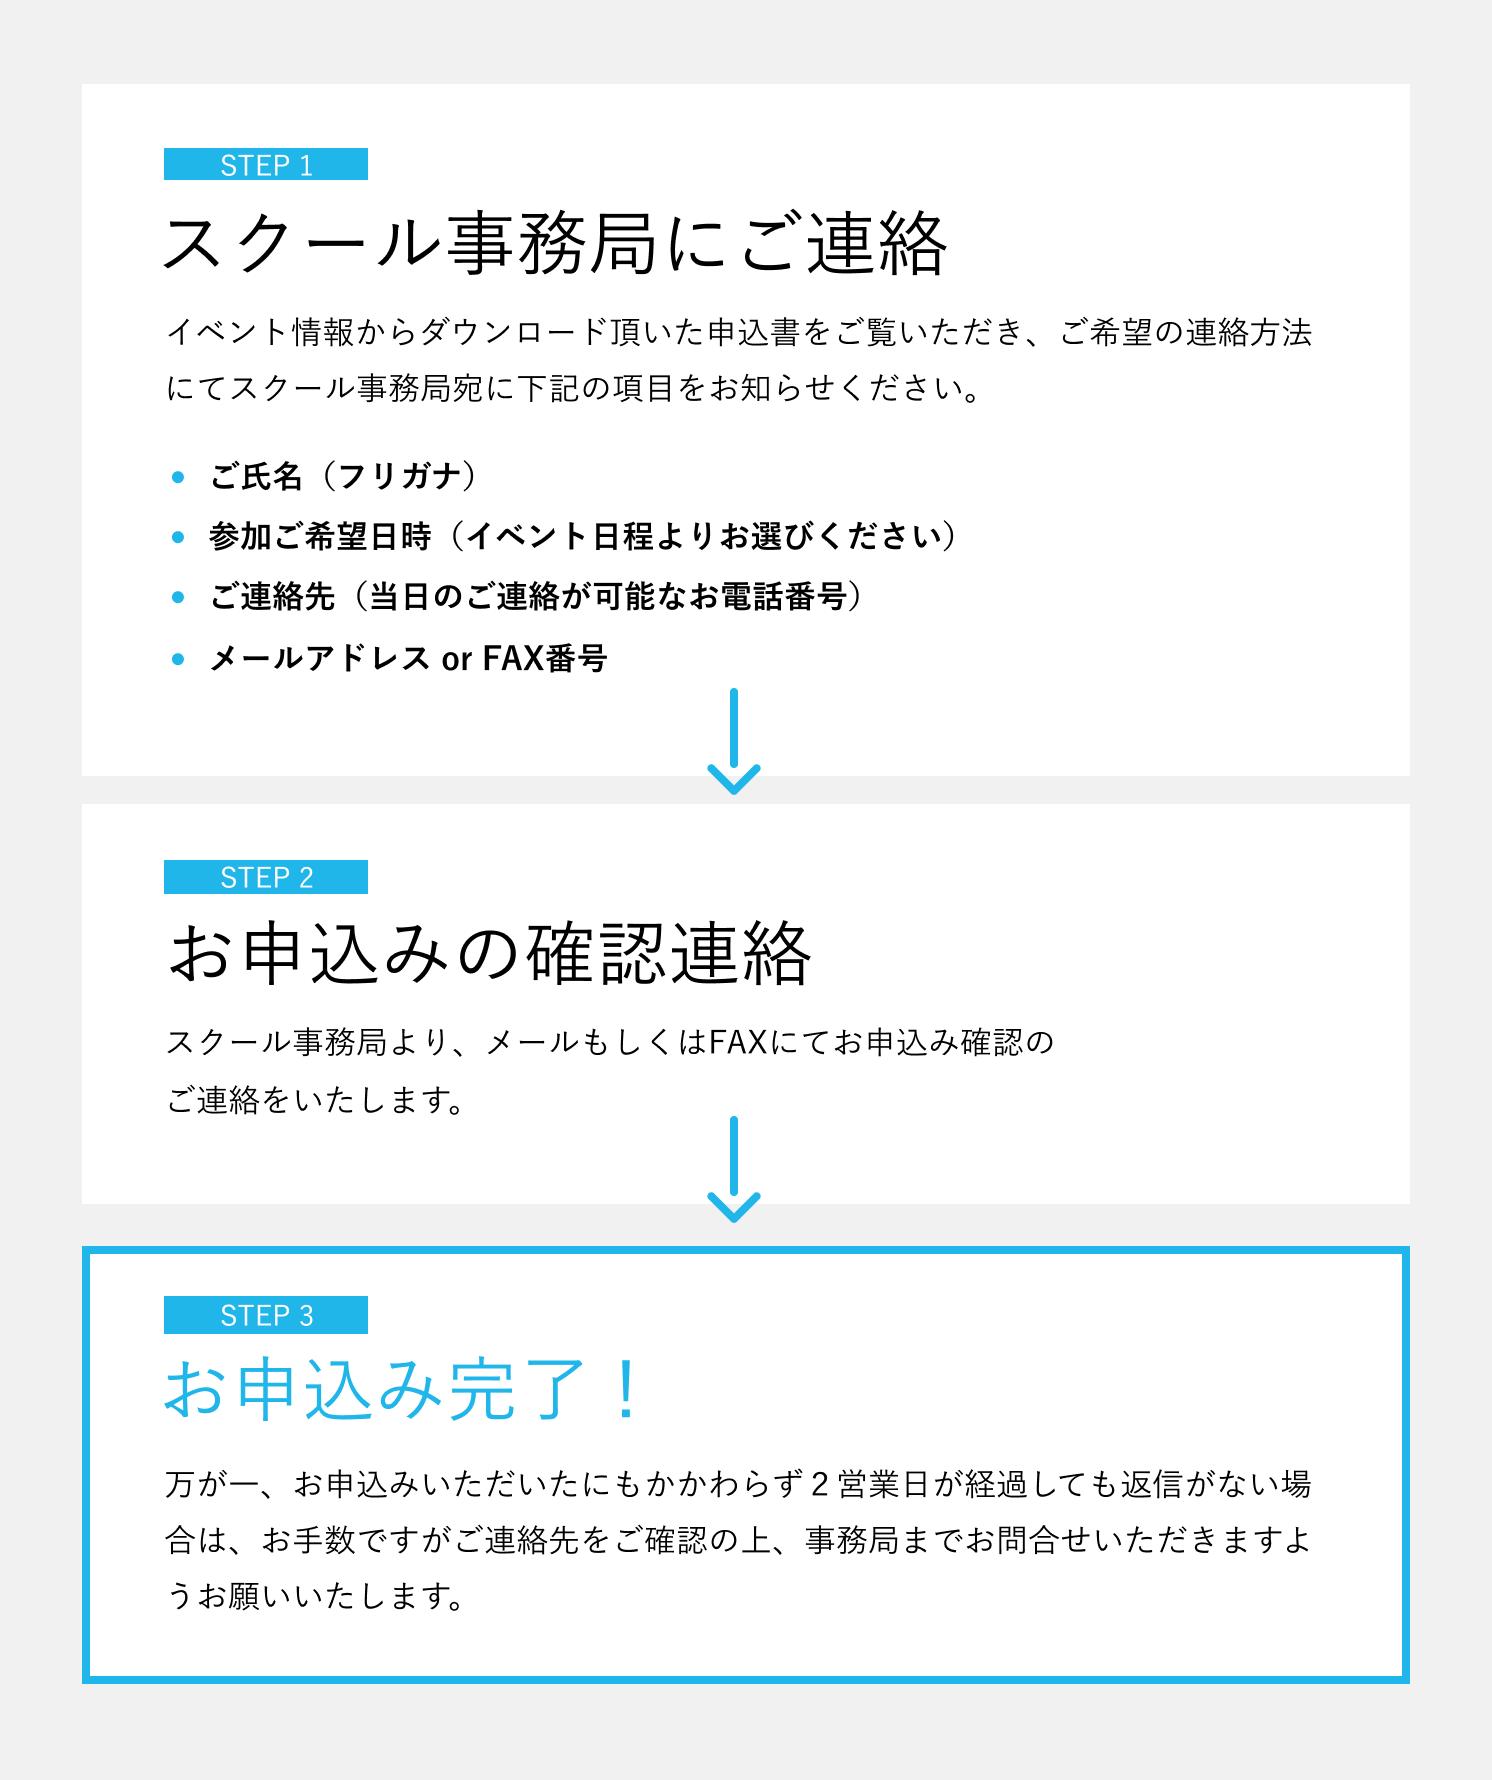 STEP1 スクール事務局にご連絡 > STEP2 お申込みの確認連絡 > STEP3 お申込み完了!